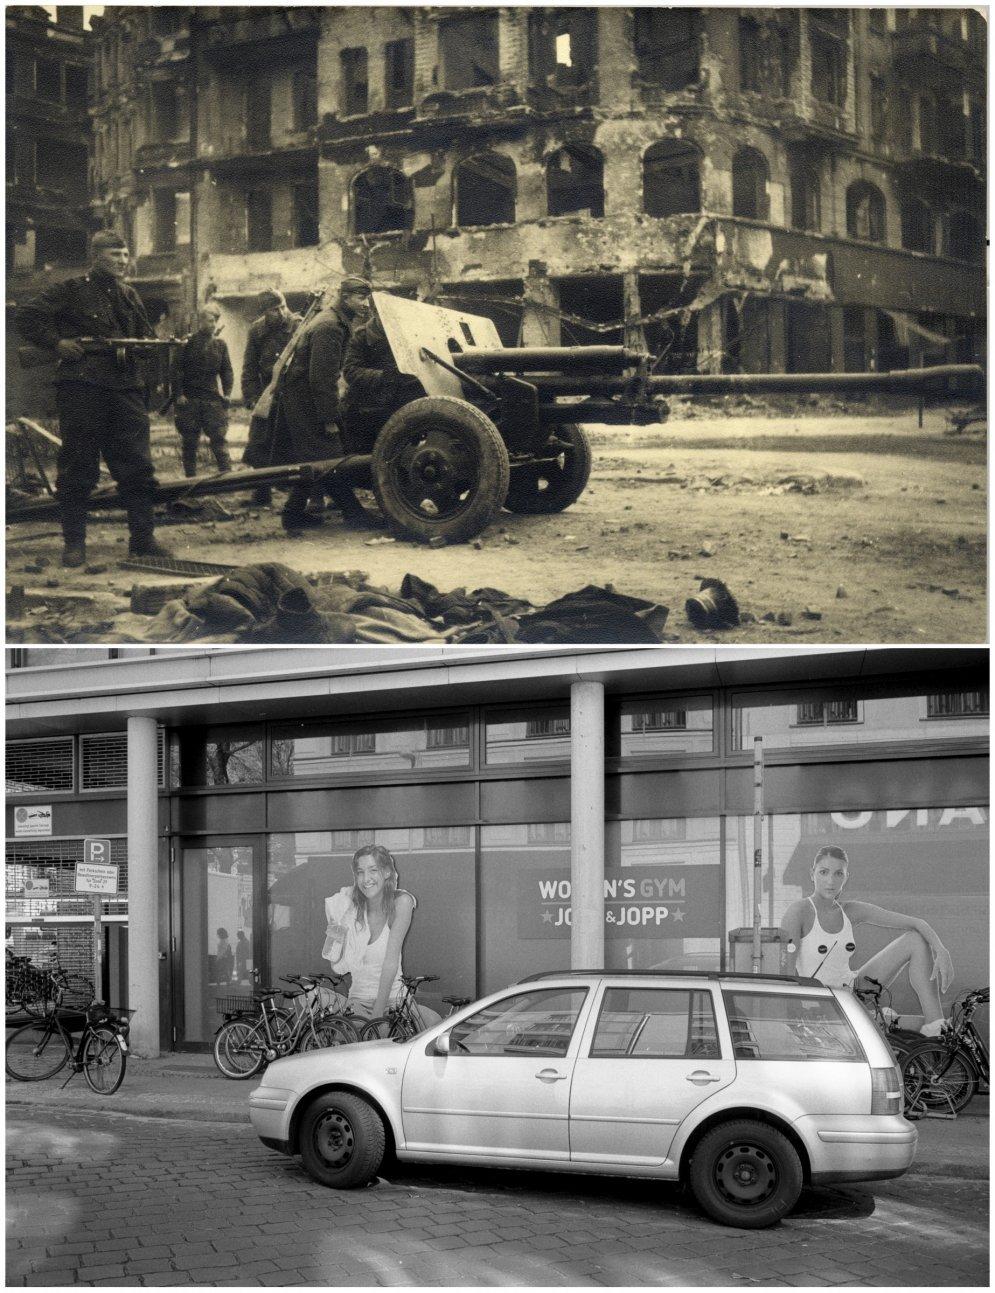 Битва за Берлин: 14 ФОТО улиц столицы Германии в мае 1945-го — и сегодня